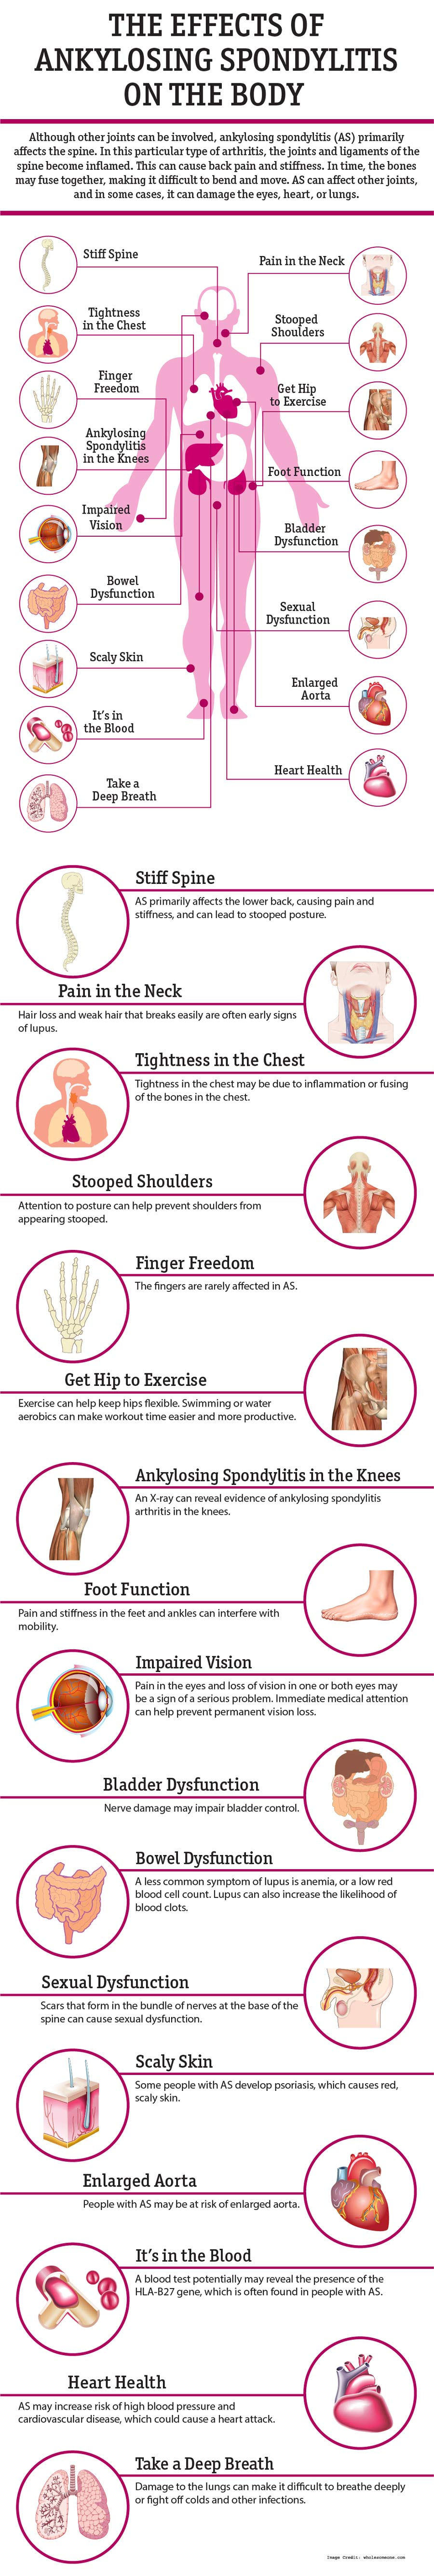 Ankylosing Spondylitis Info